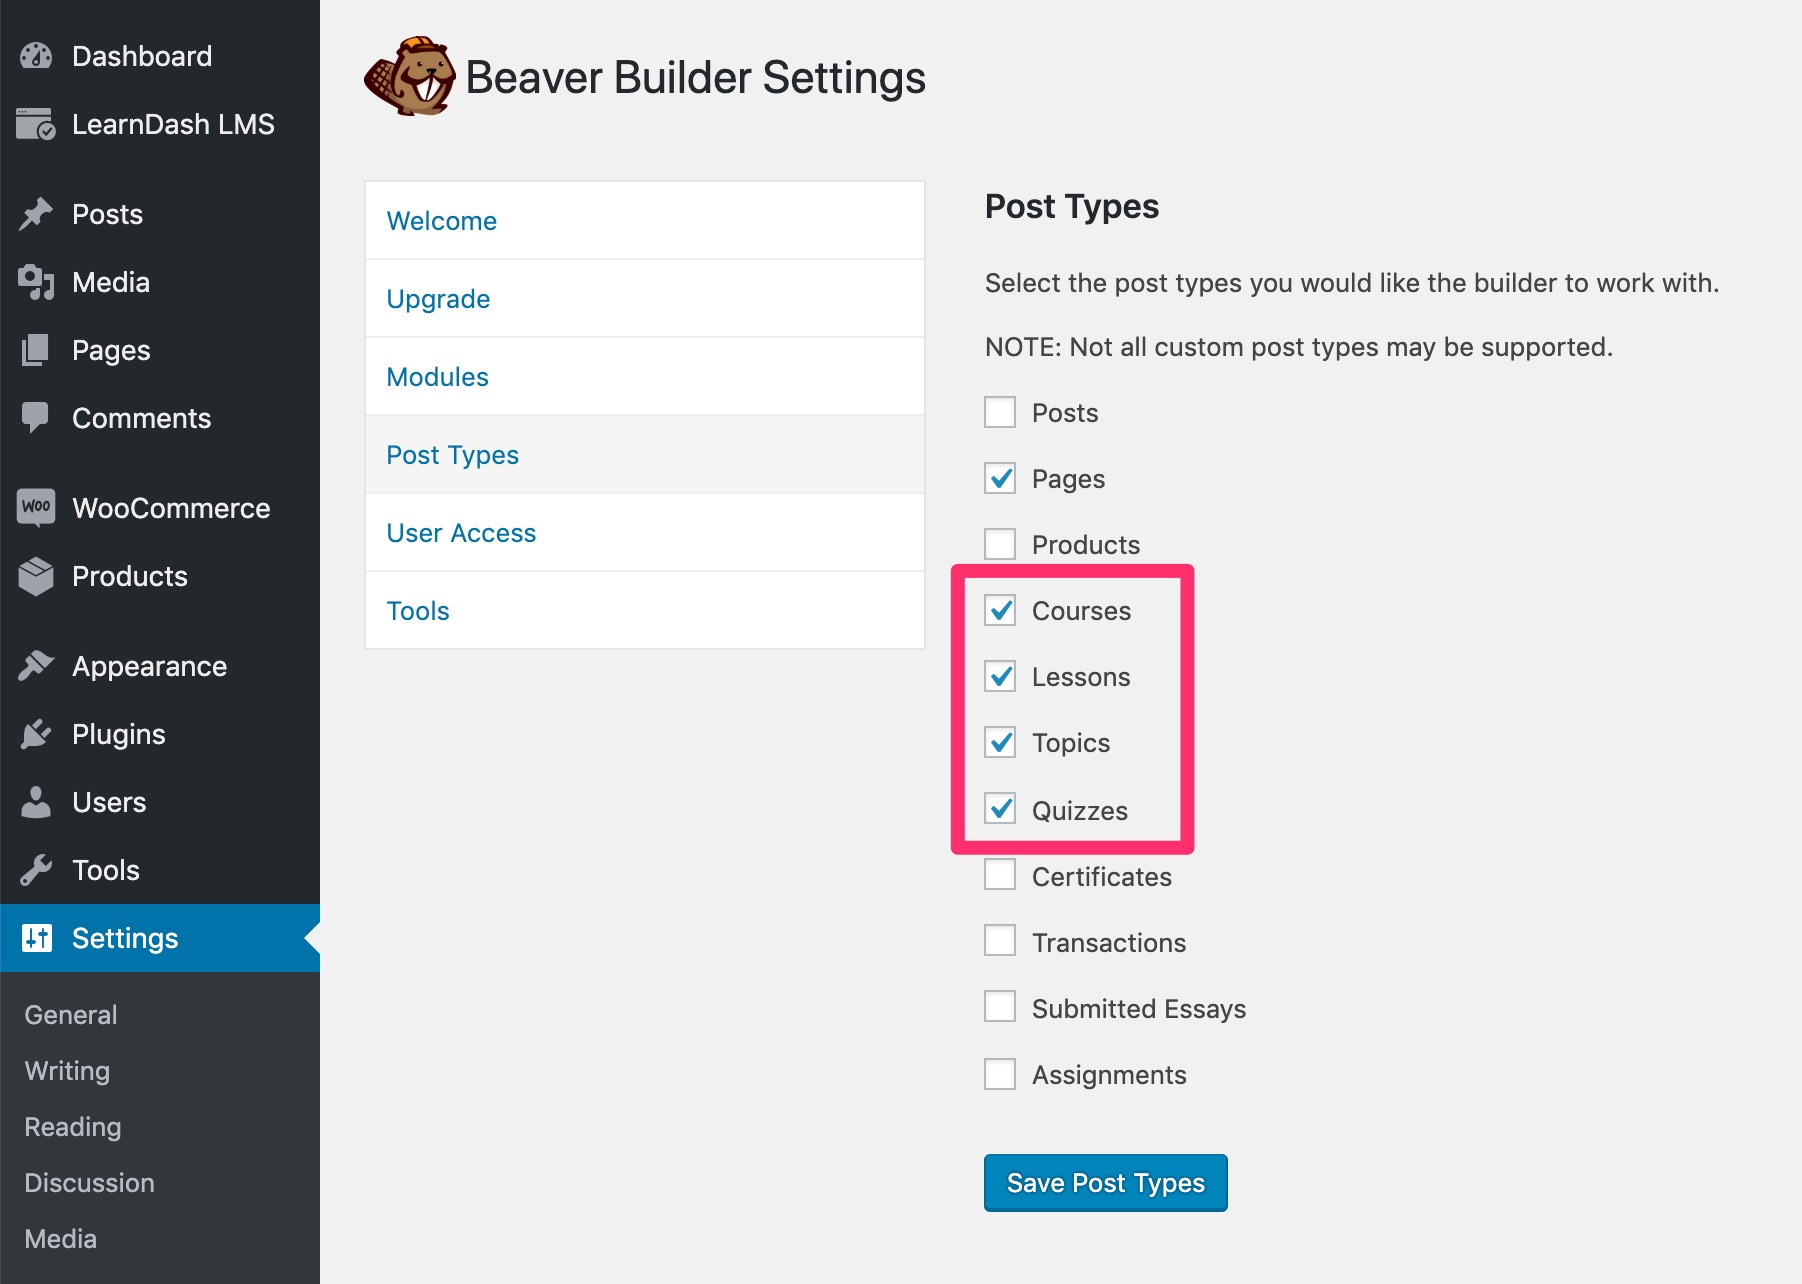 Enable LearnDash post types in Beaver Builder